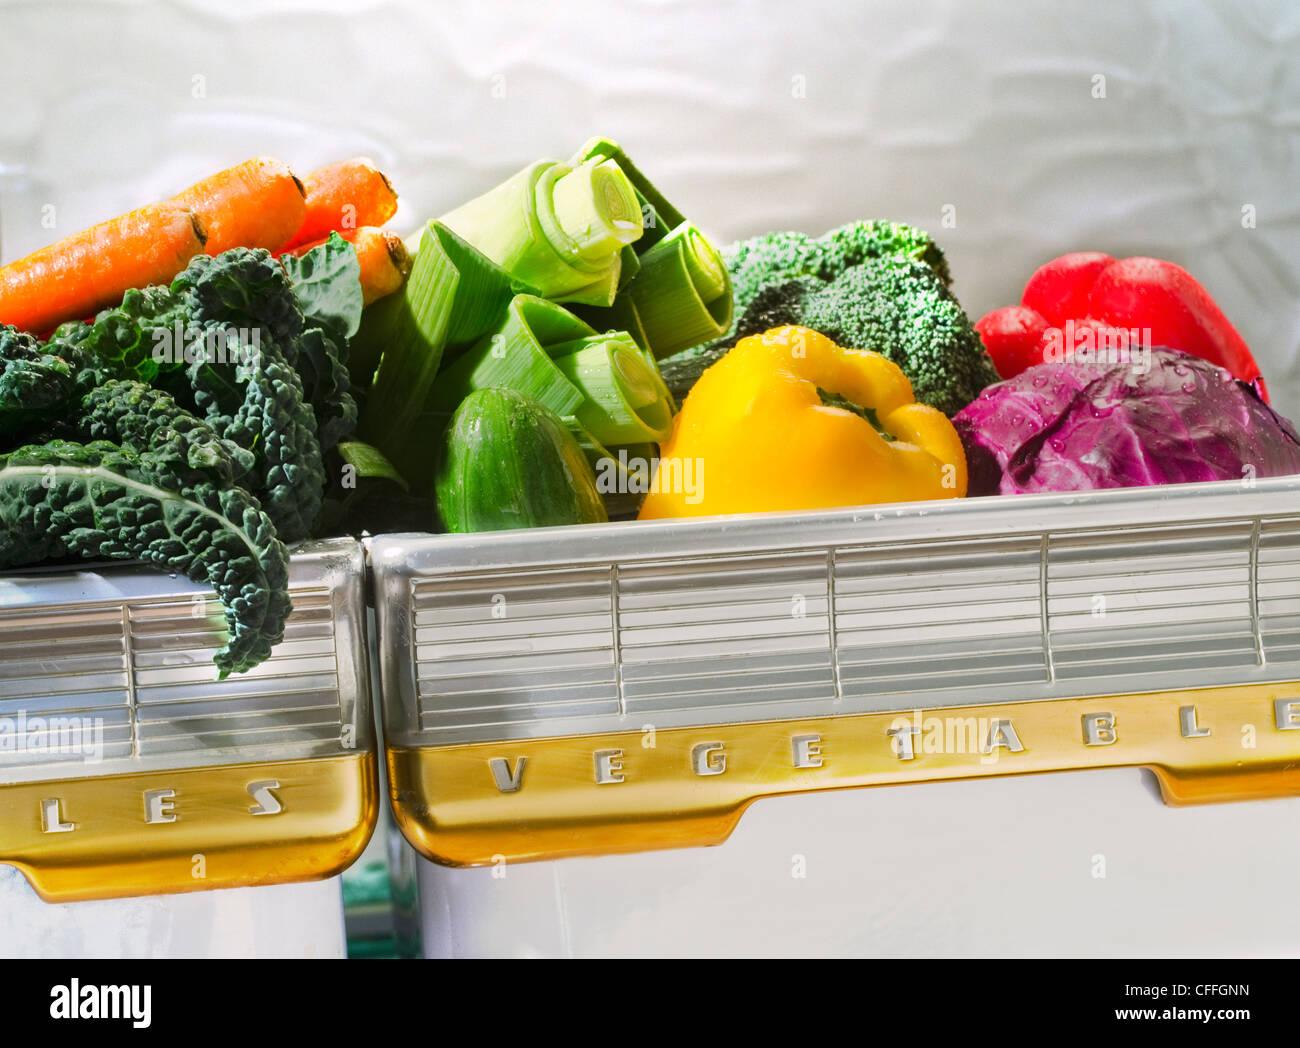 various vegetable in retro refrigerator bin Stock Photo